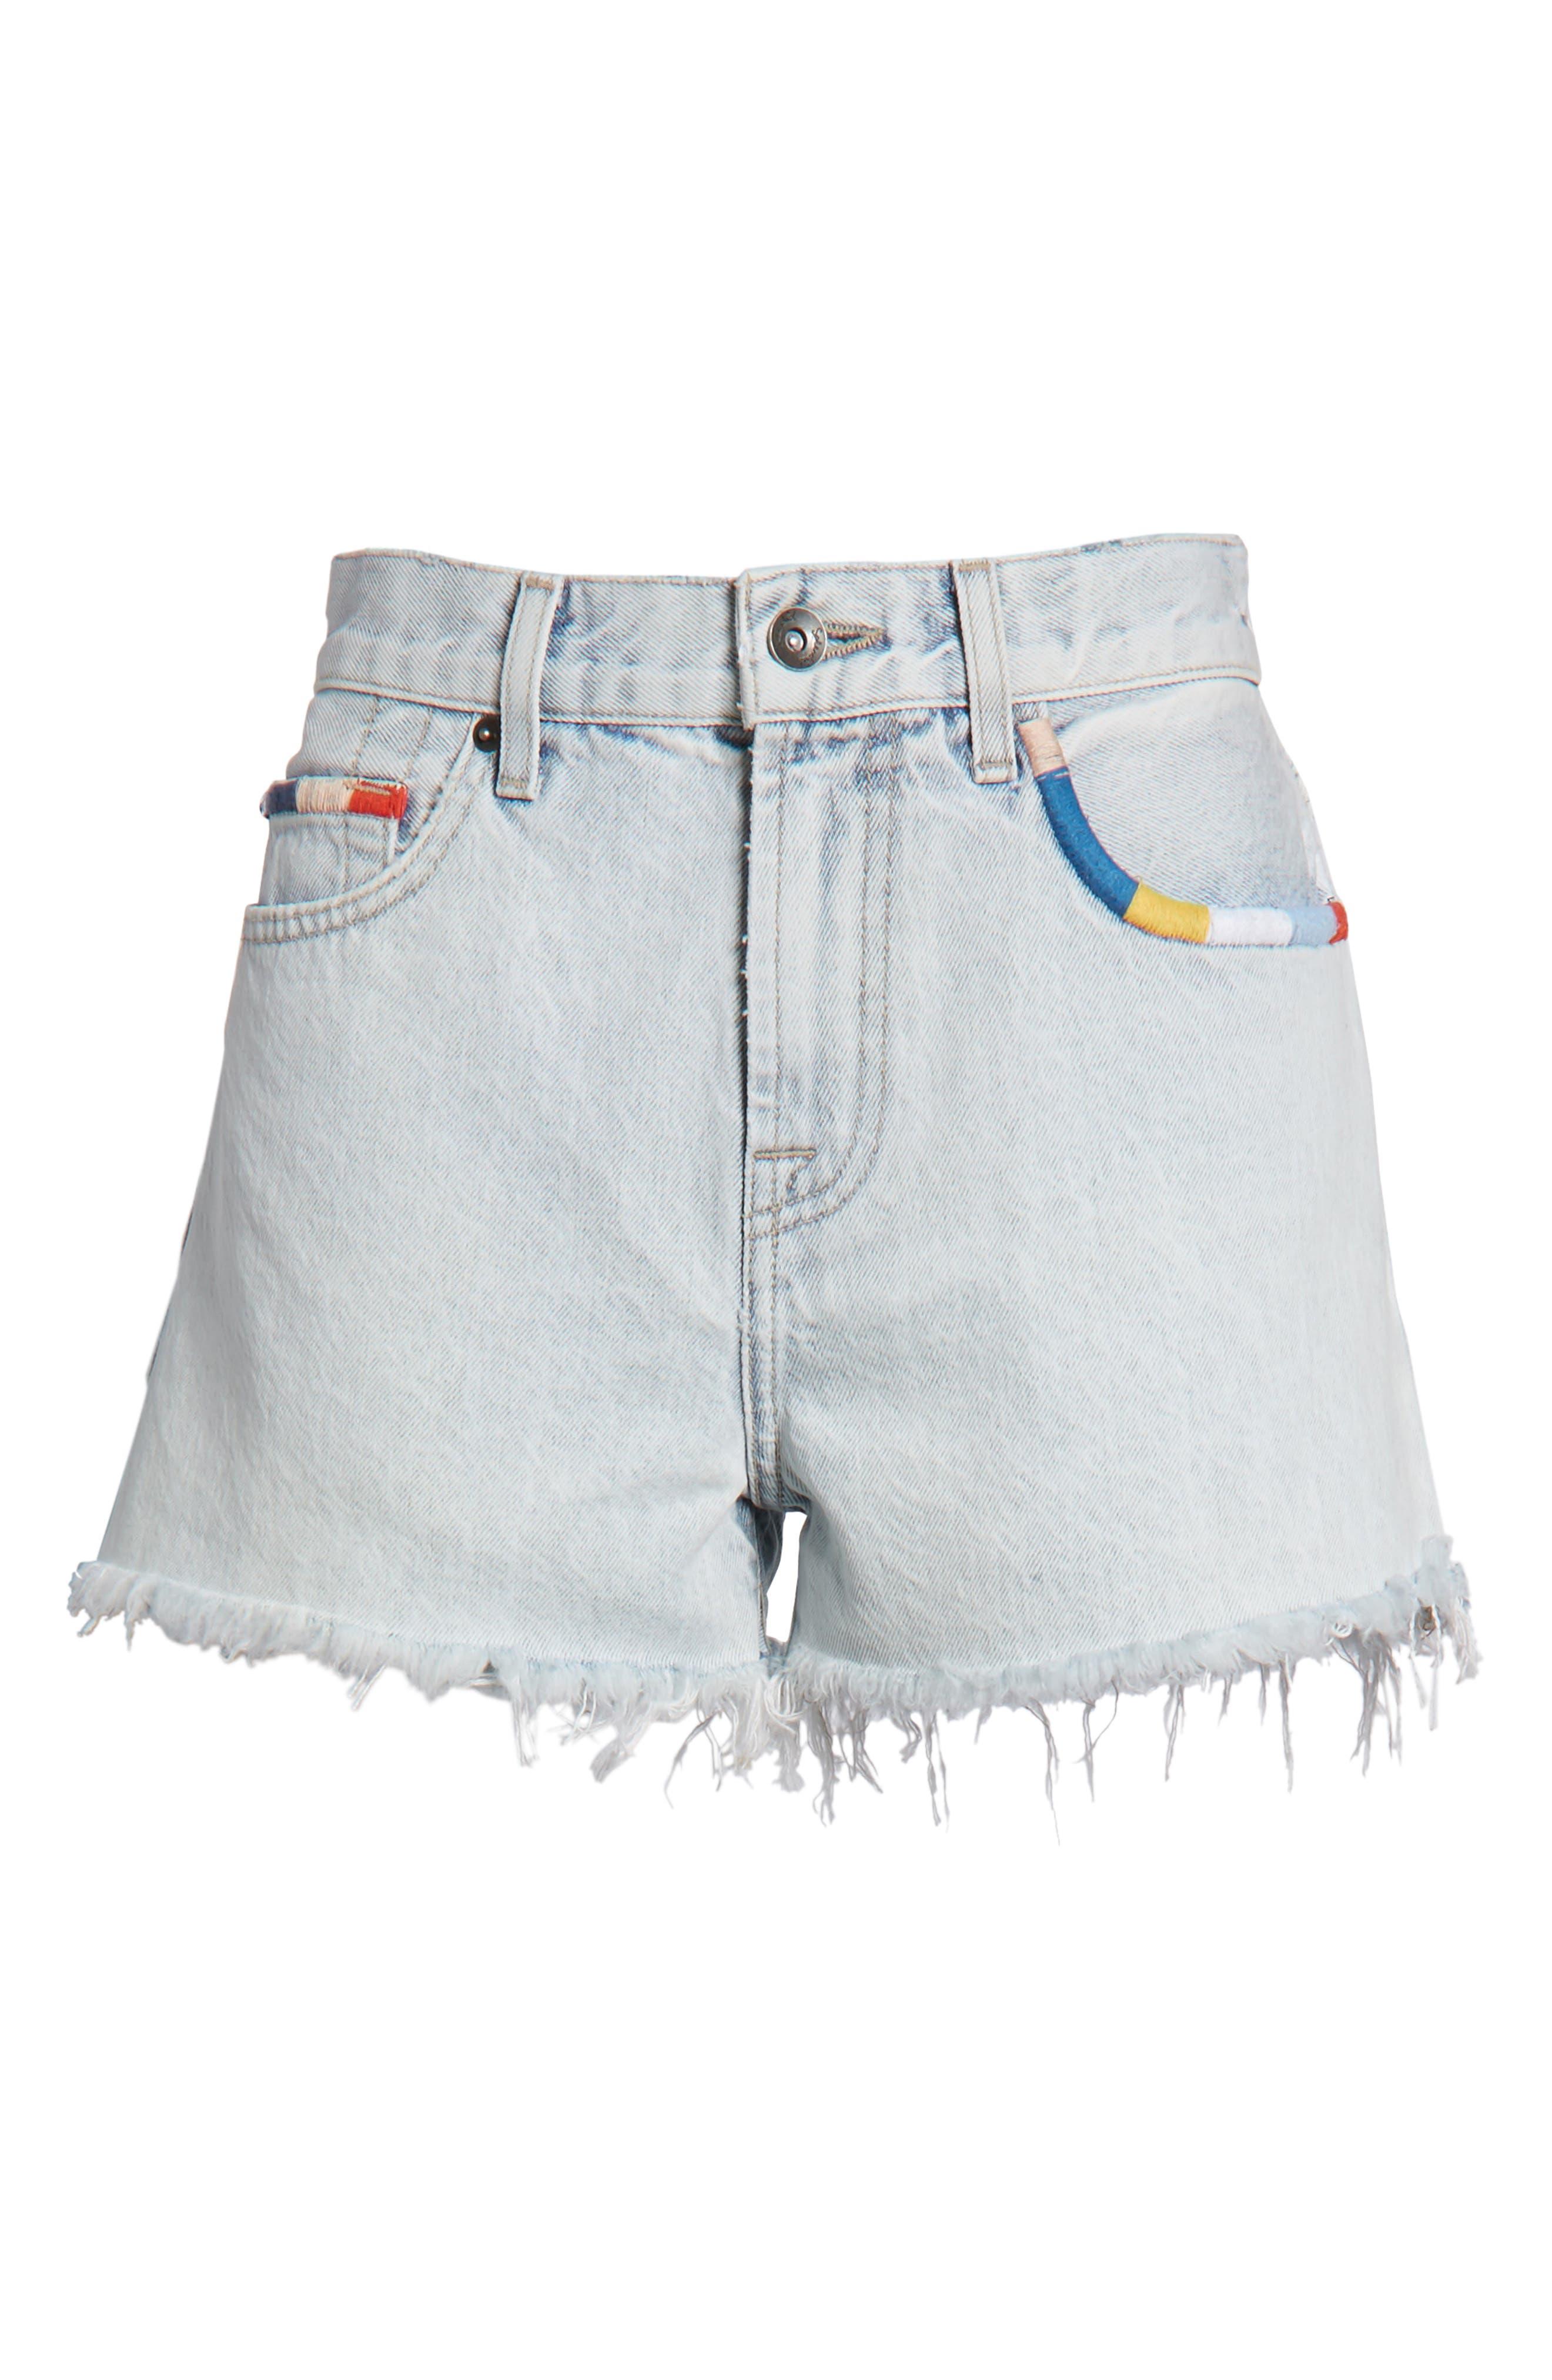 x Margherita Amore Denim Cutoff Shorts,                             Alternate thumbnail 6, color,                             429